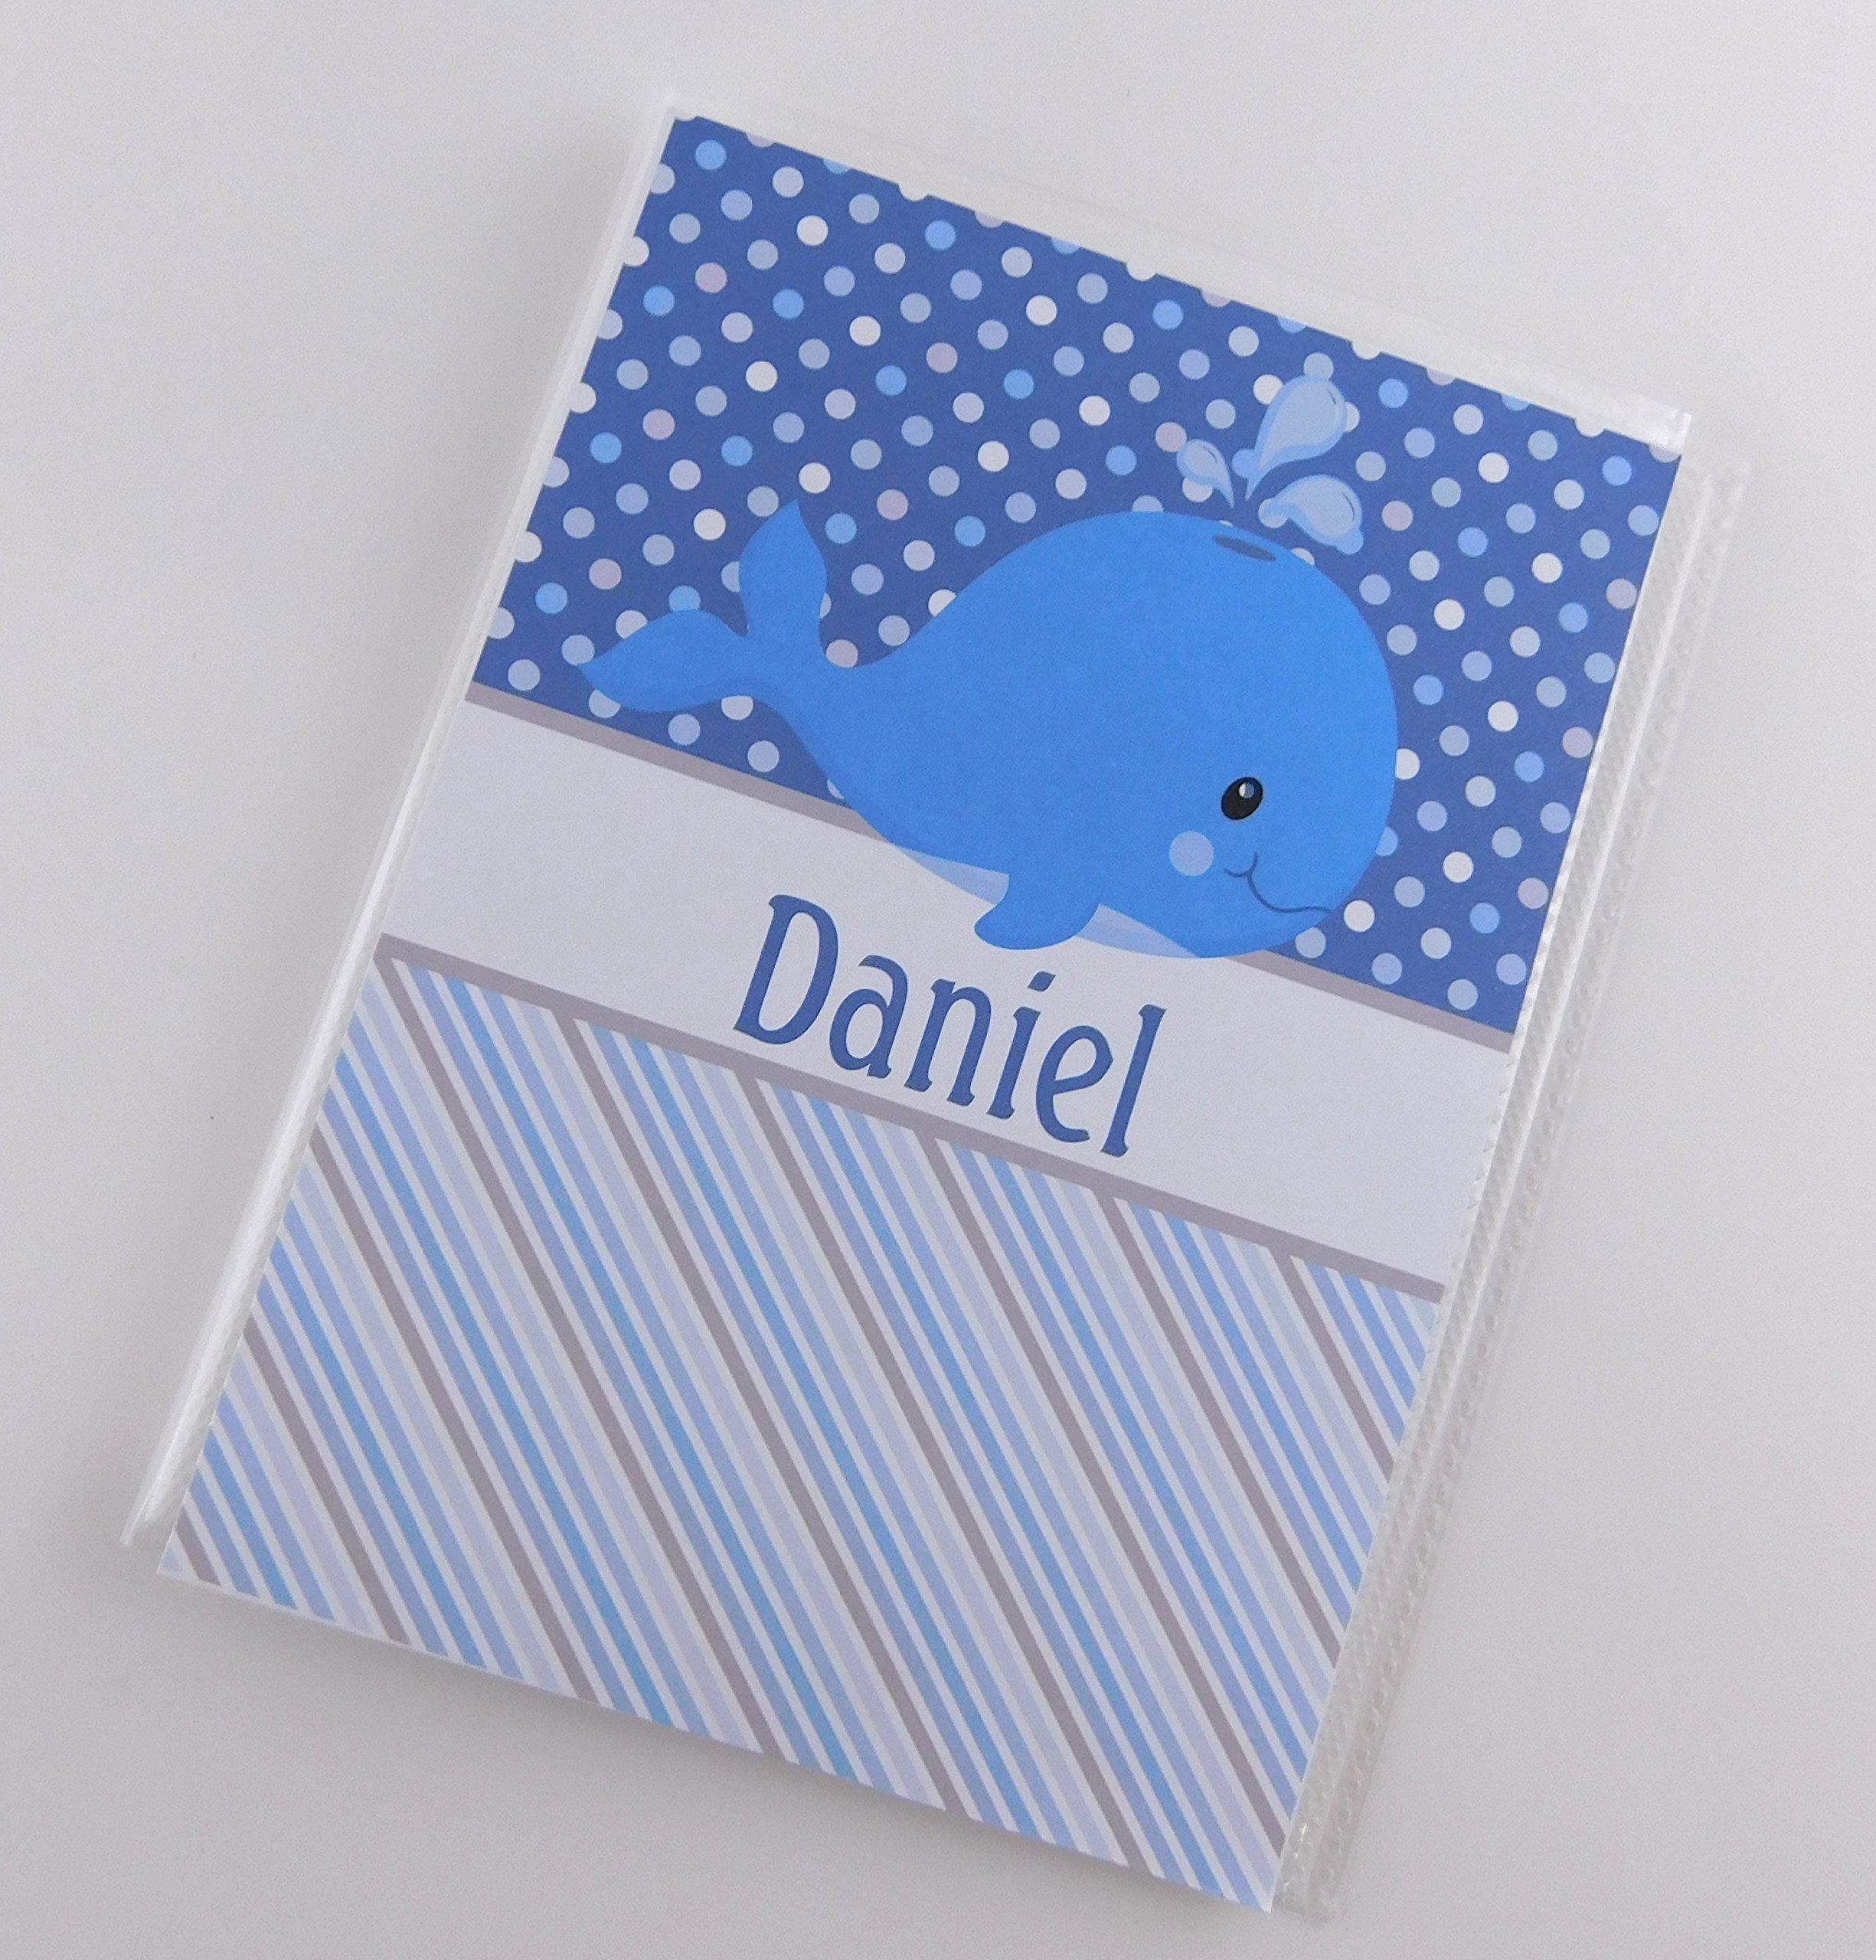 Grandma's Baby Brag Book IA#853 Boy Photo Album 4x6 or 5x7 Pictures Photo Album Blue Whale Polka Dot